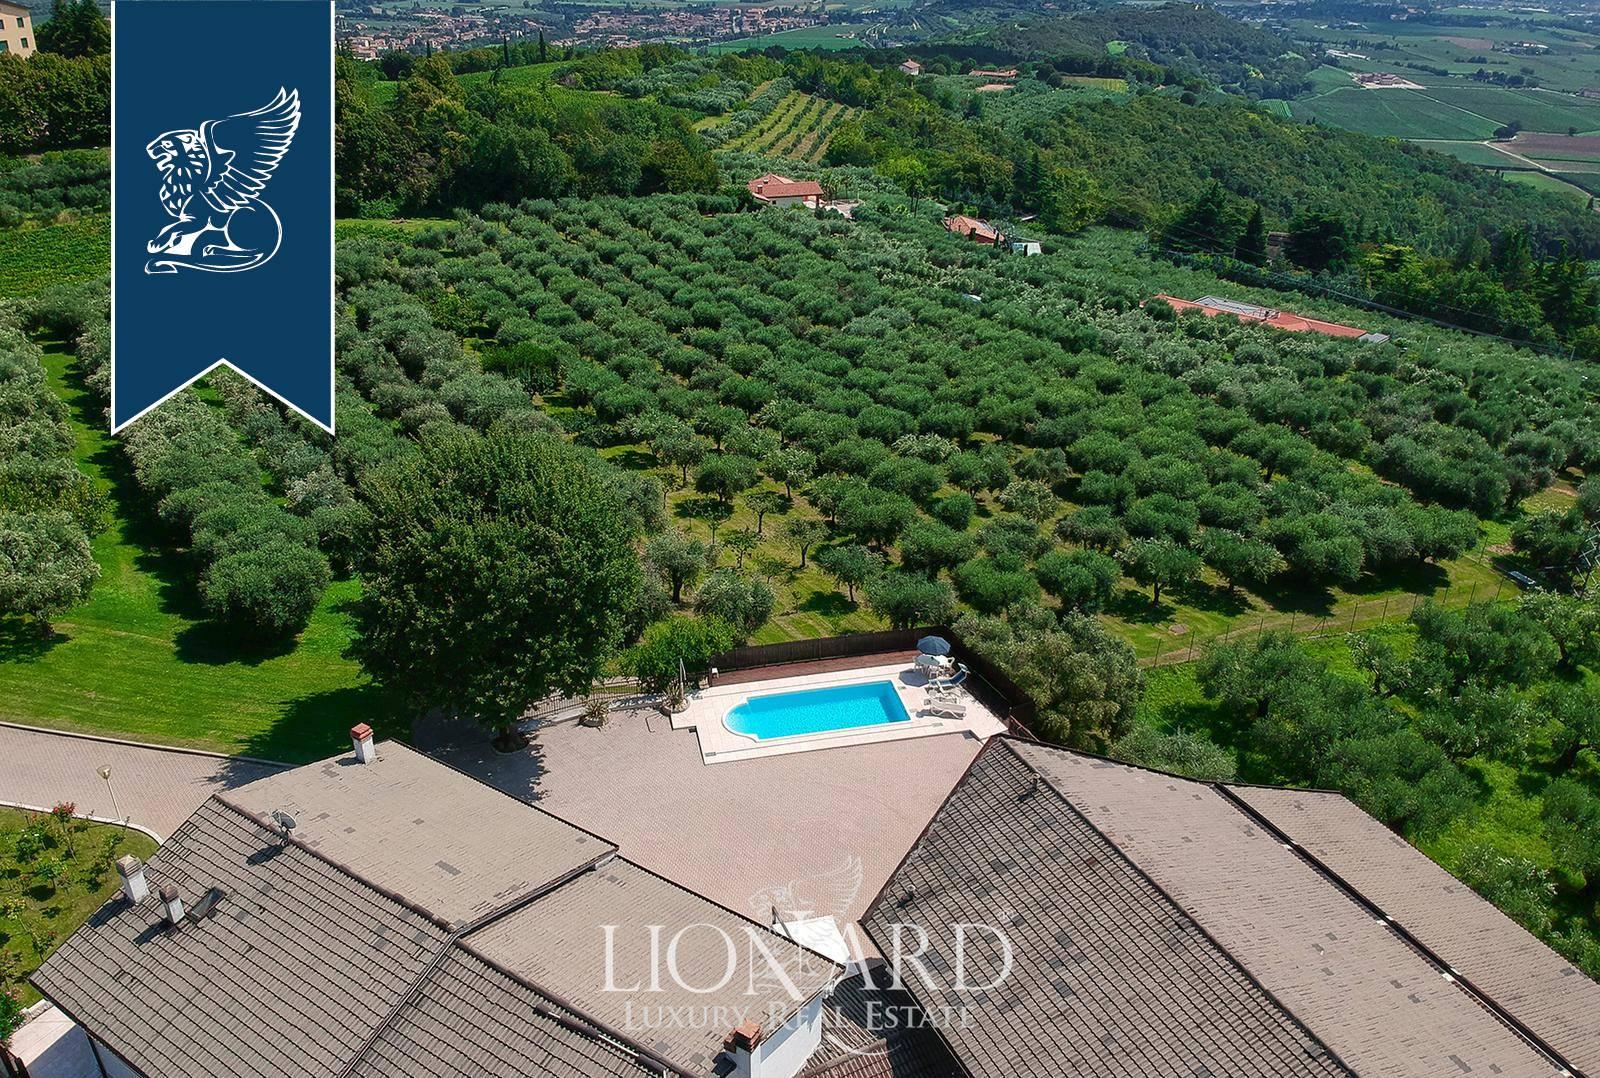 Villa in Vendita a Verona: 0 locali, 1000 mq - Foto 7